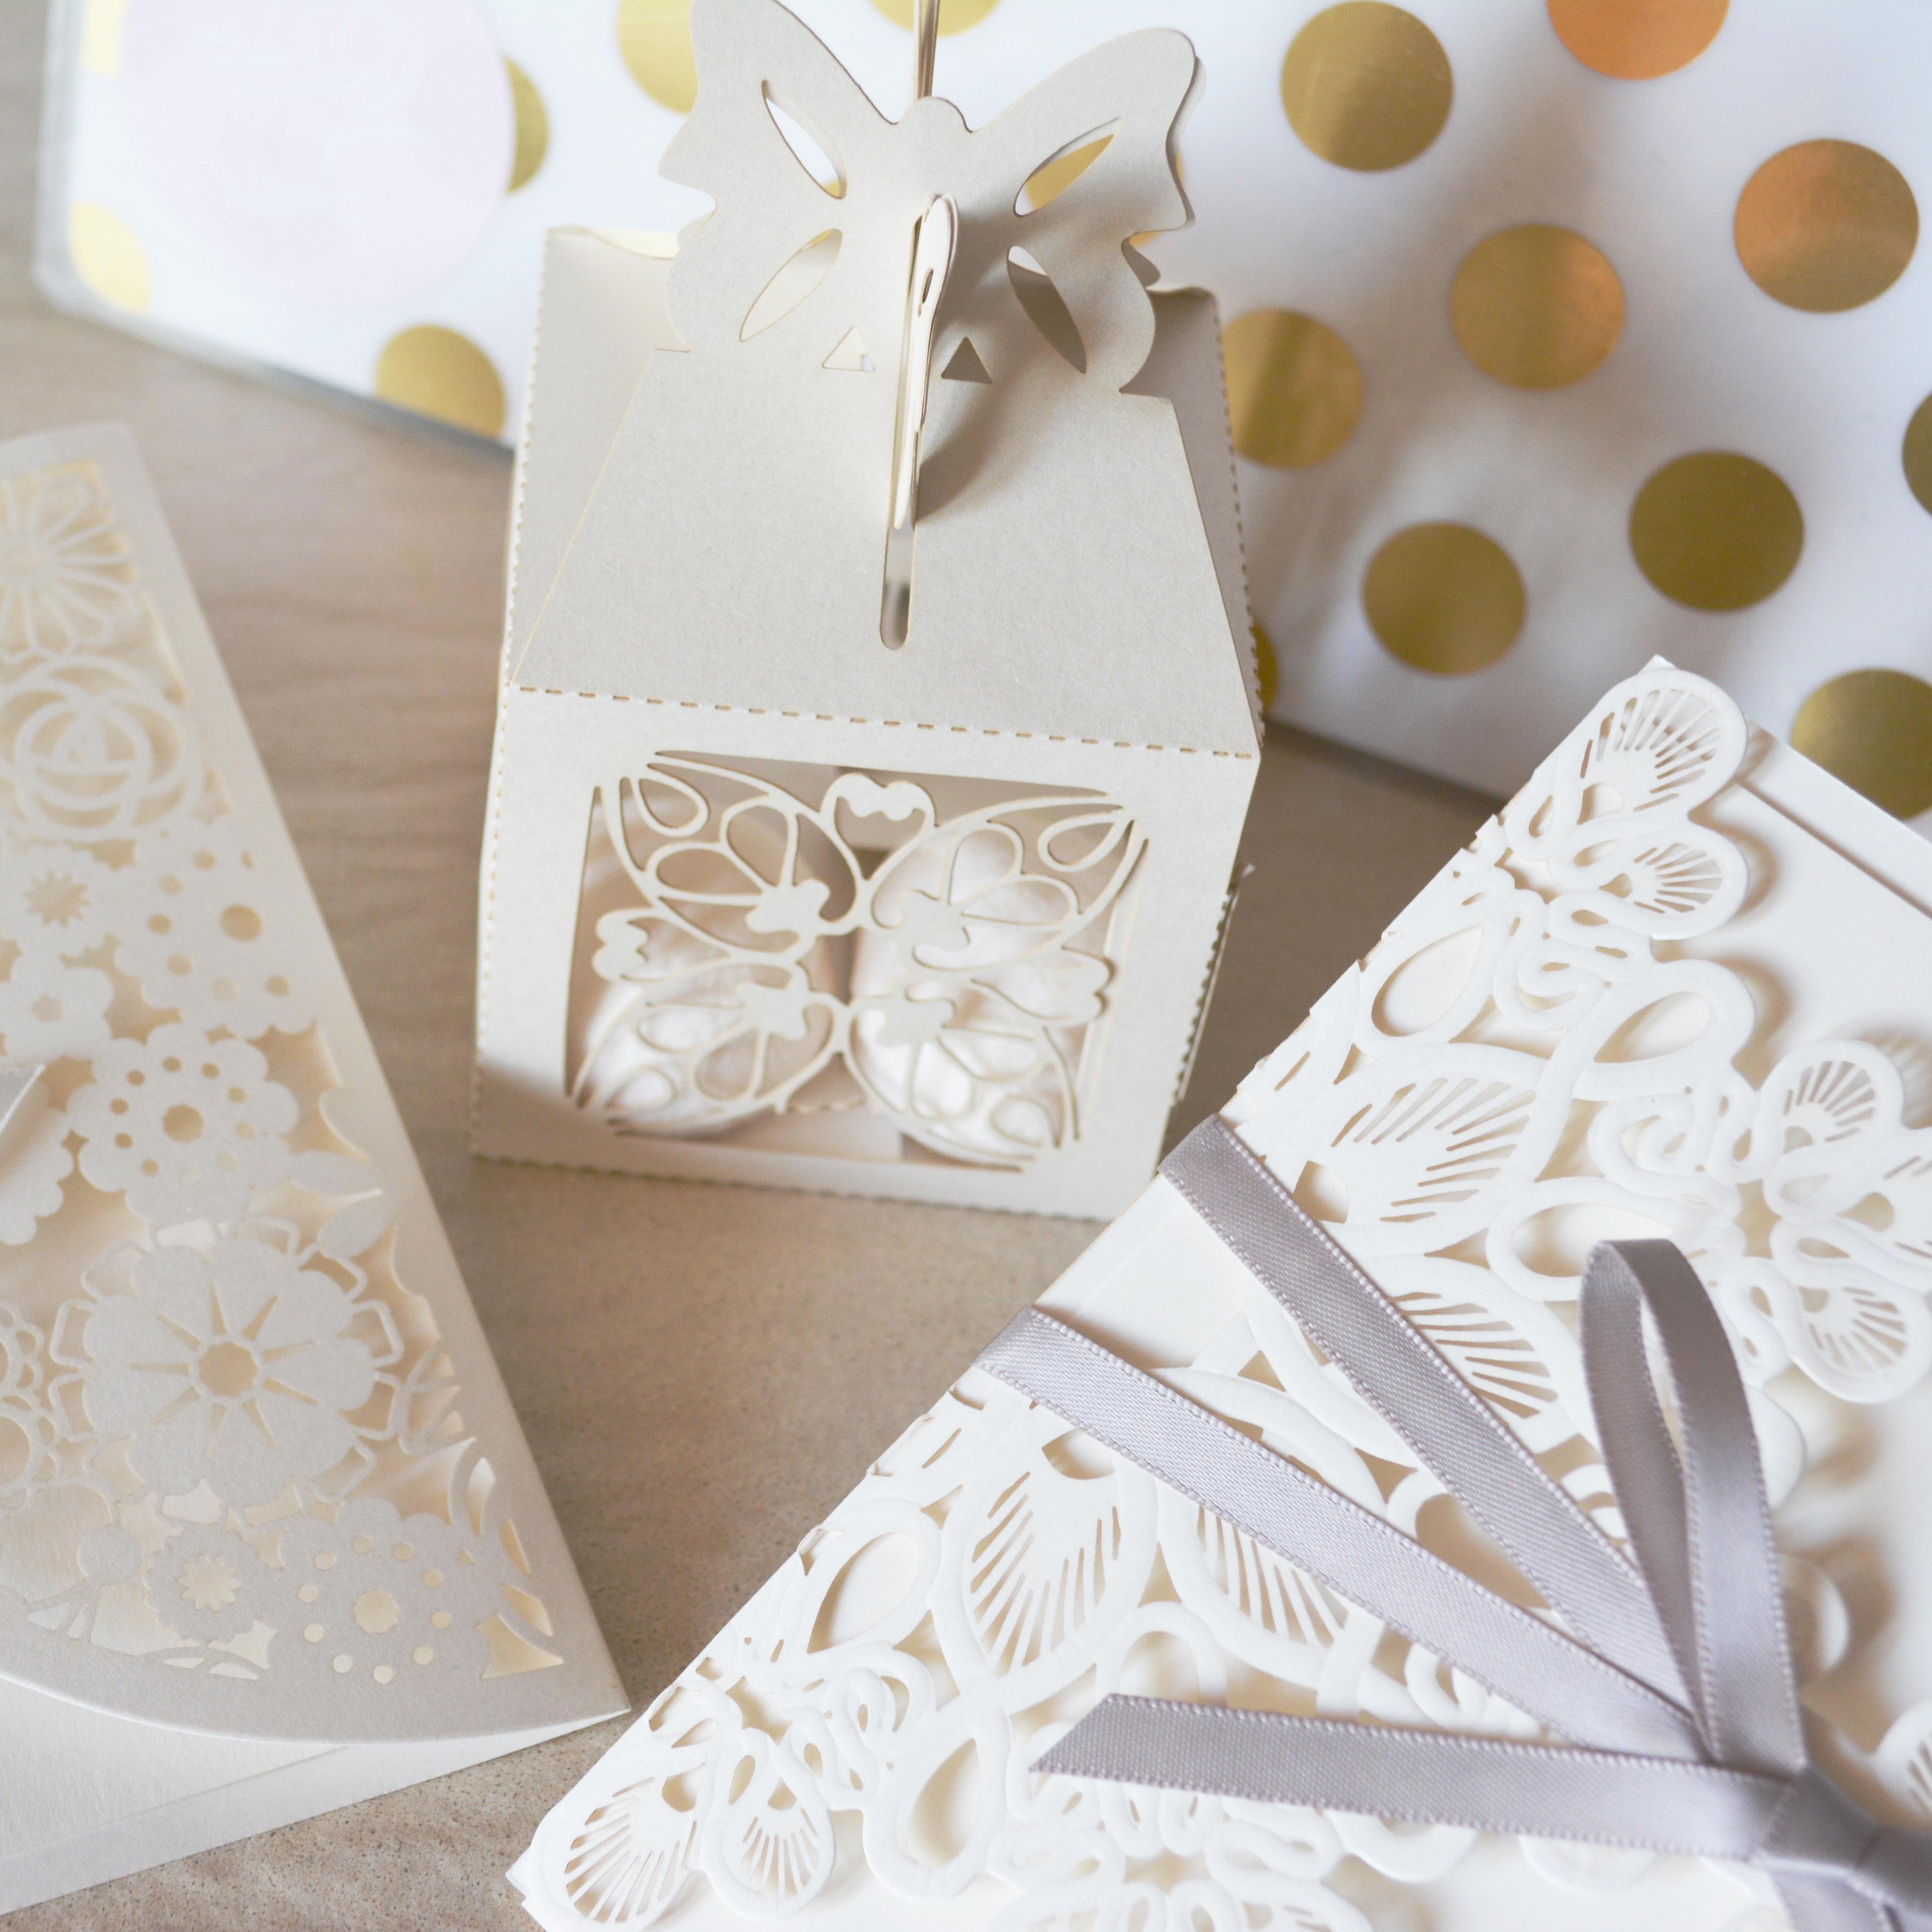 Wedding Invitation Etiquette- When to send out Wedding invitations